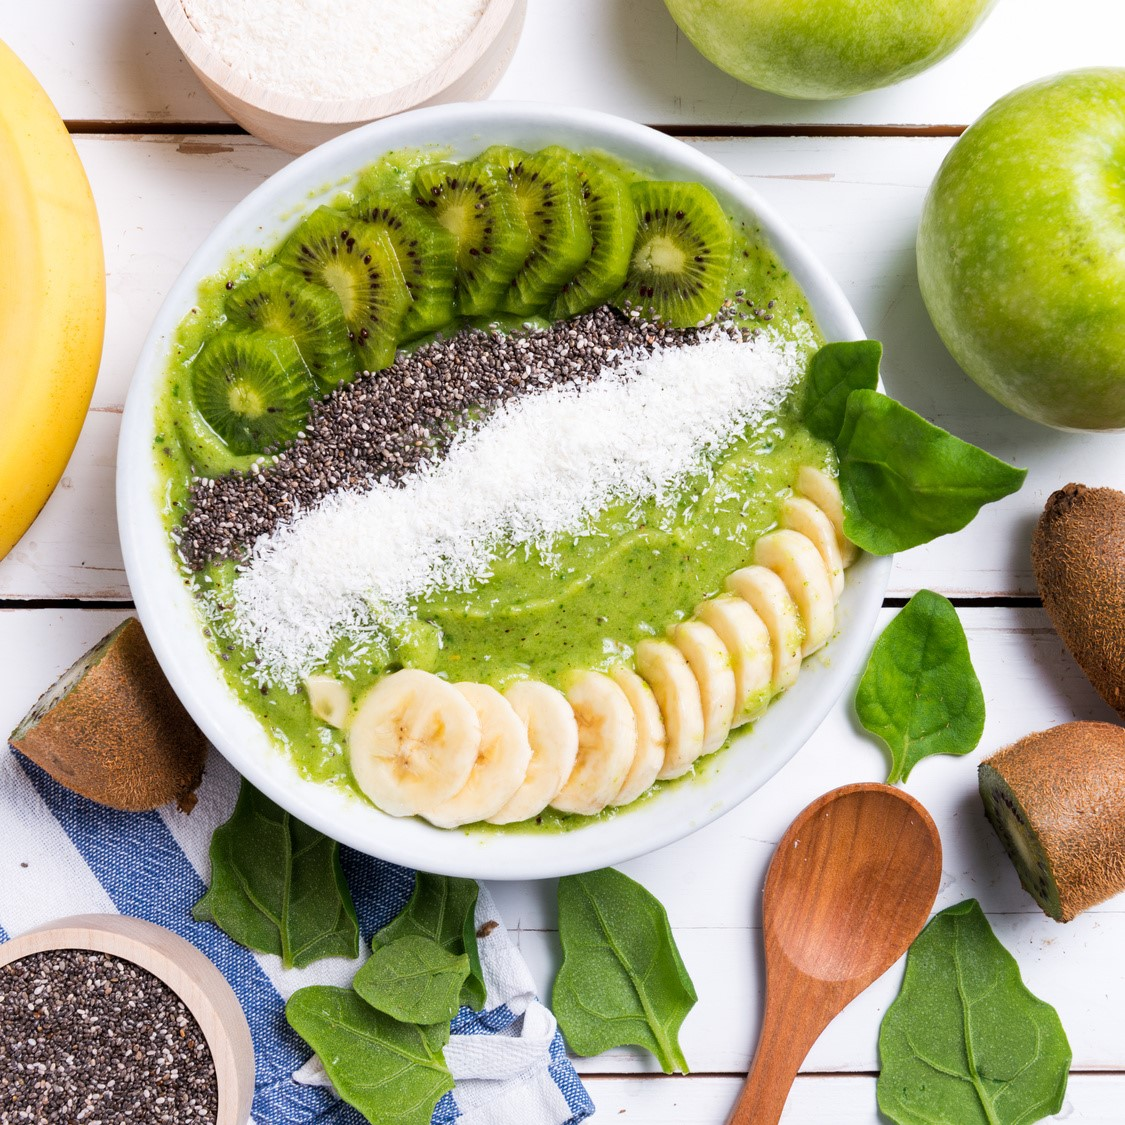 Oscar® kiwi fruits & banana smoothie bowl